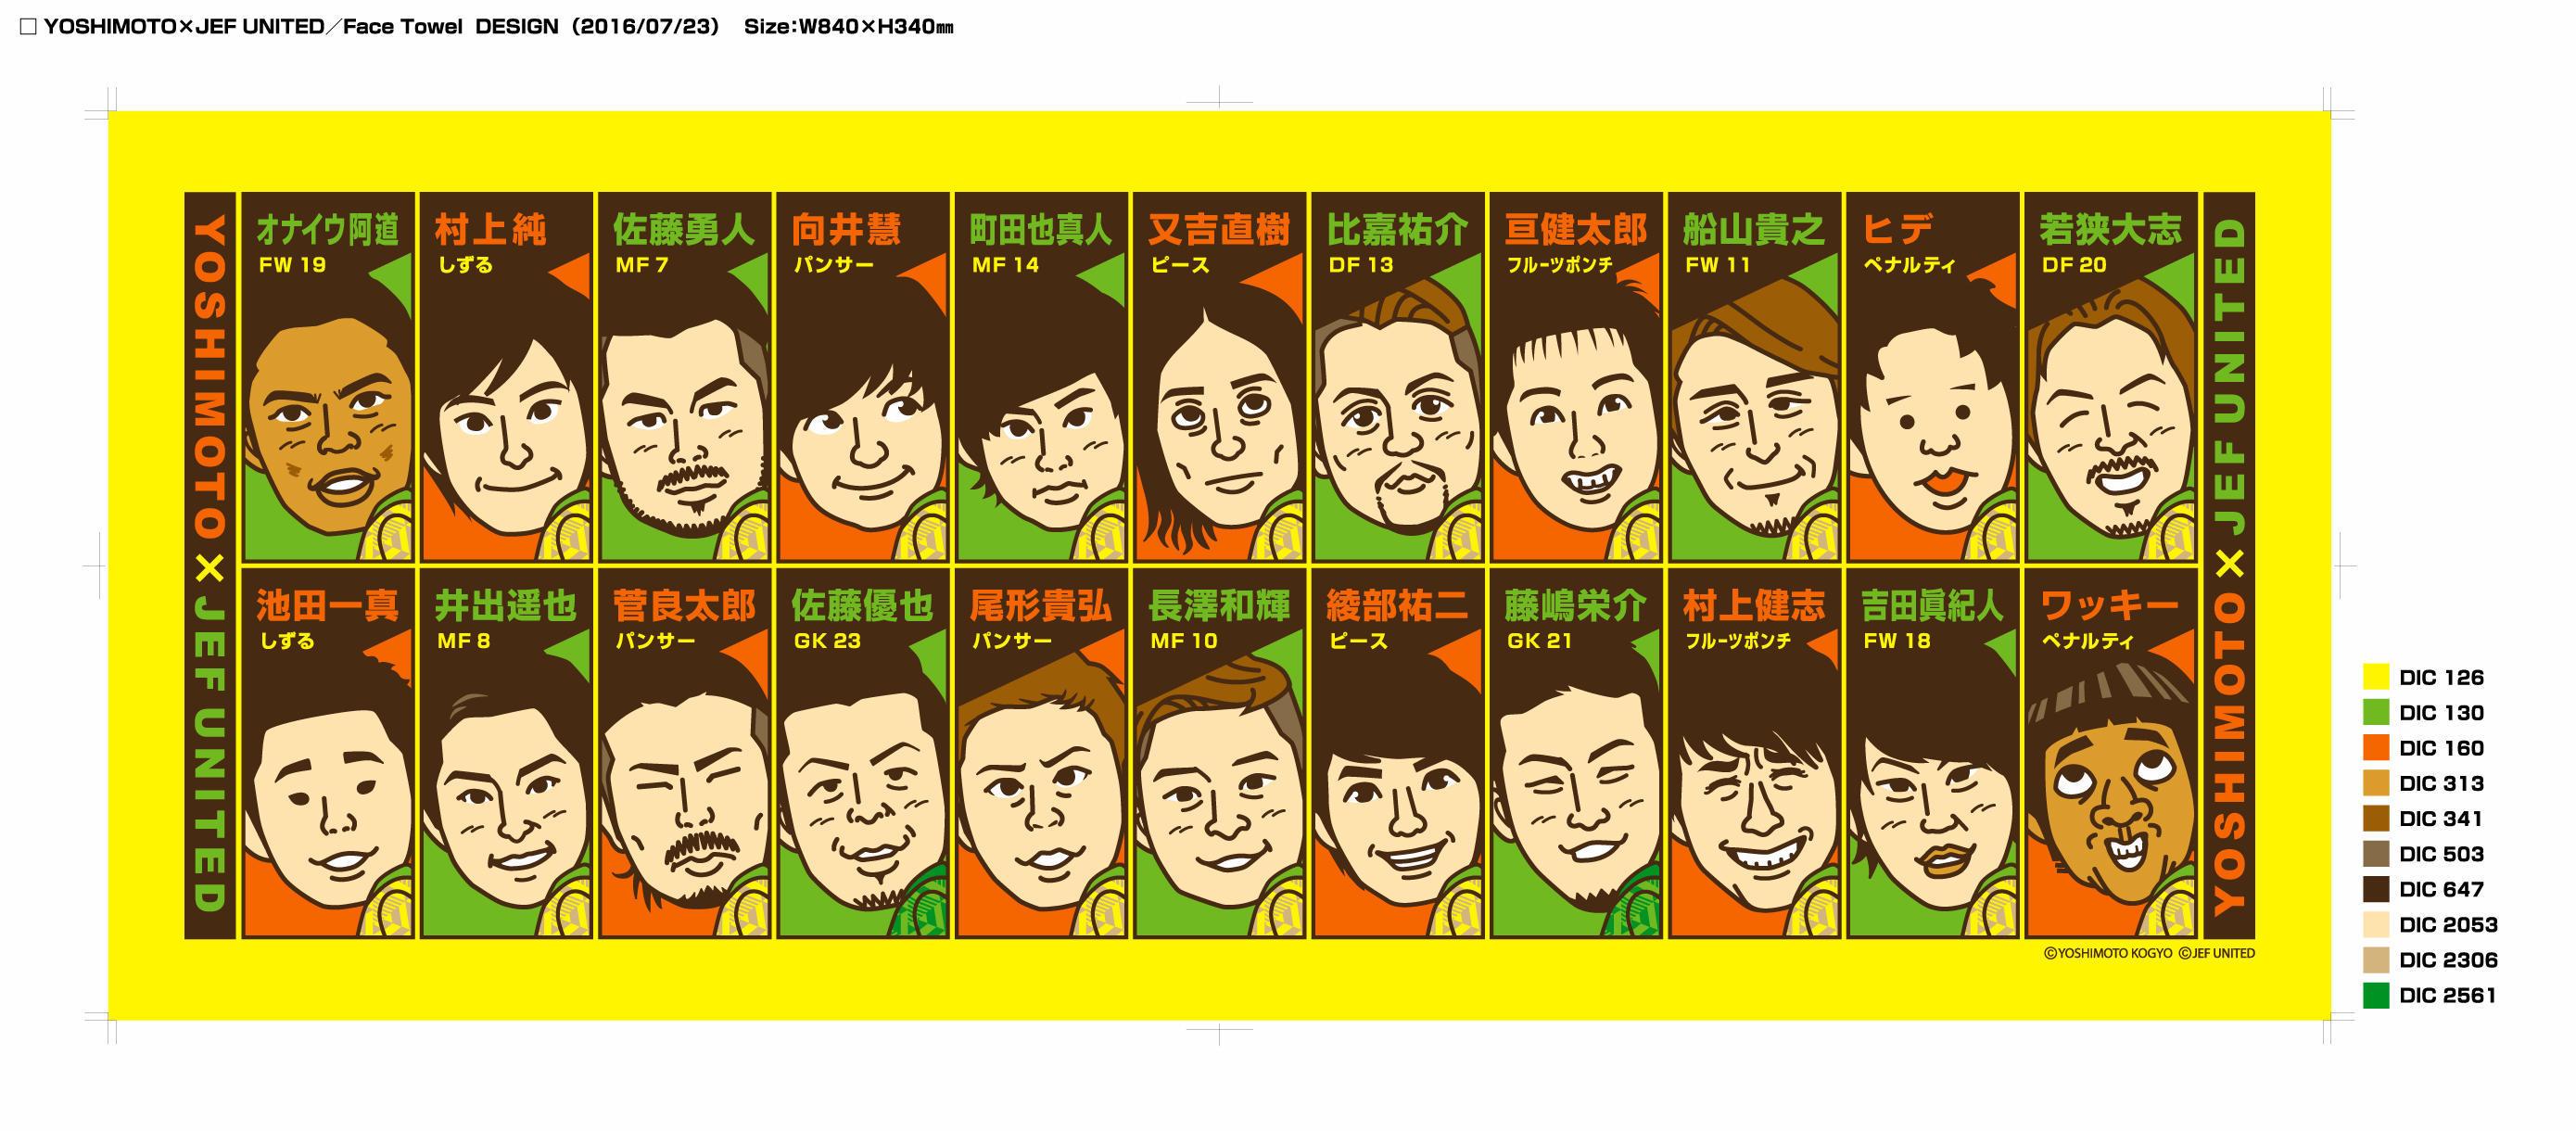 http://news.yoshimoto.co.jp/20160830230935-67e8d34ea26e452e1290e96f3338764018d8246e.jpg